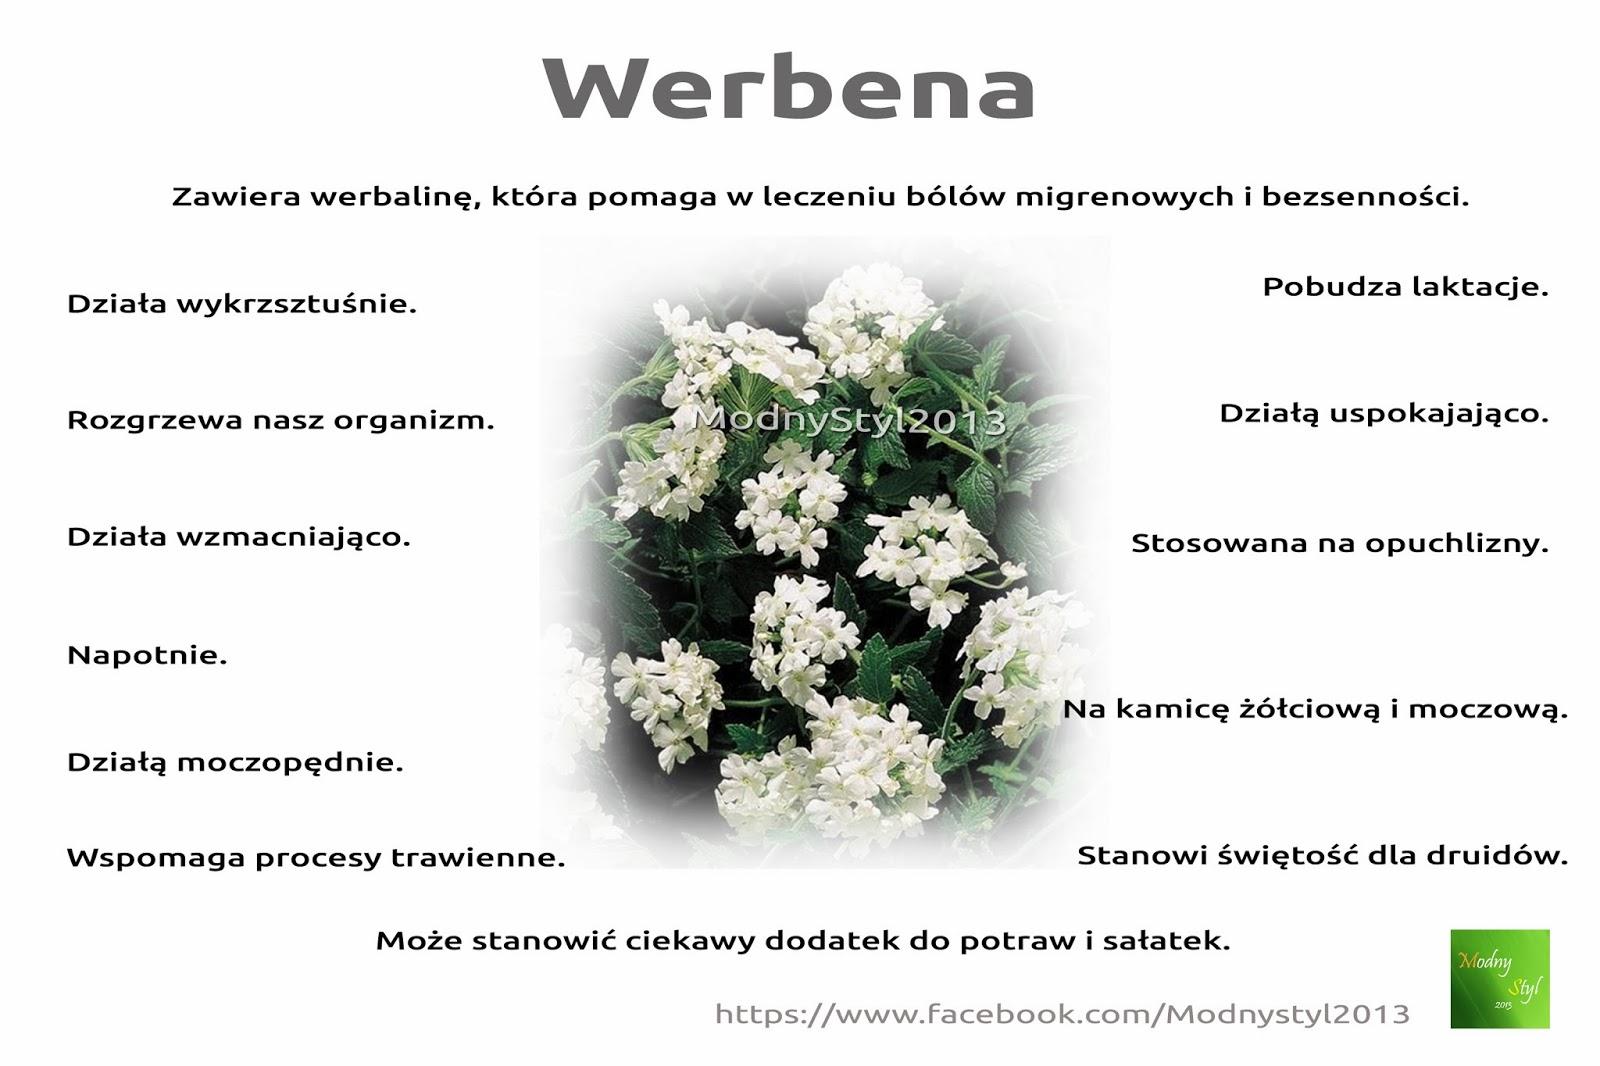 Werbena pospolita